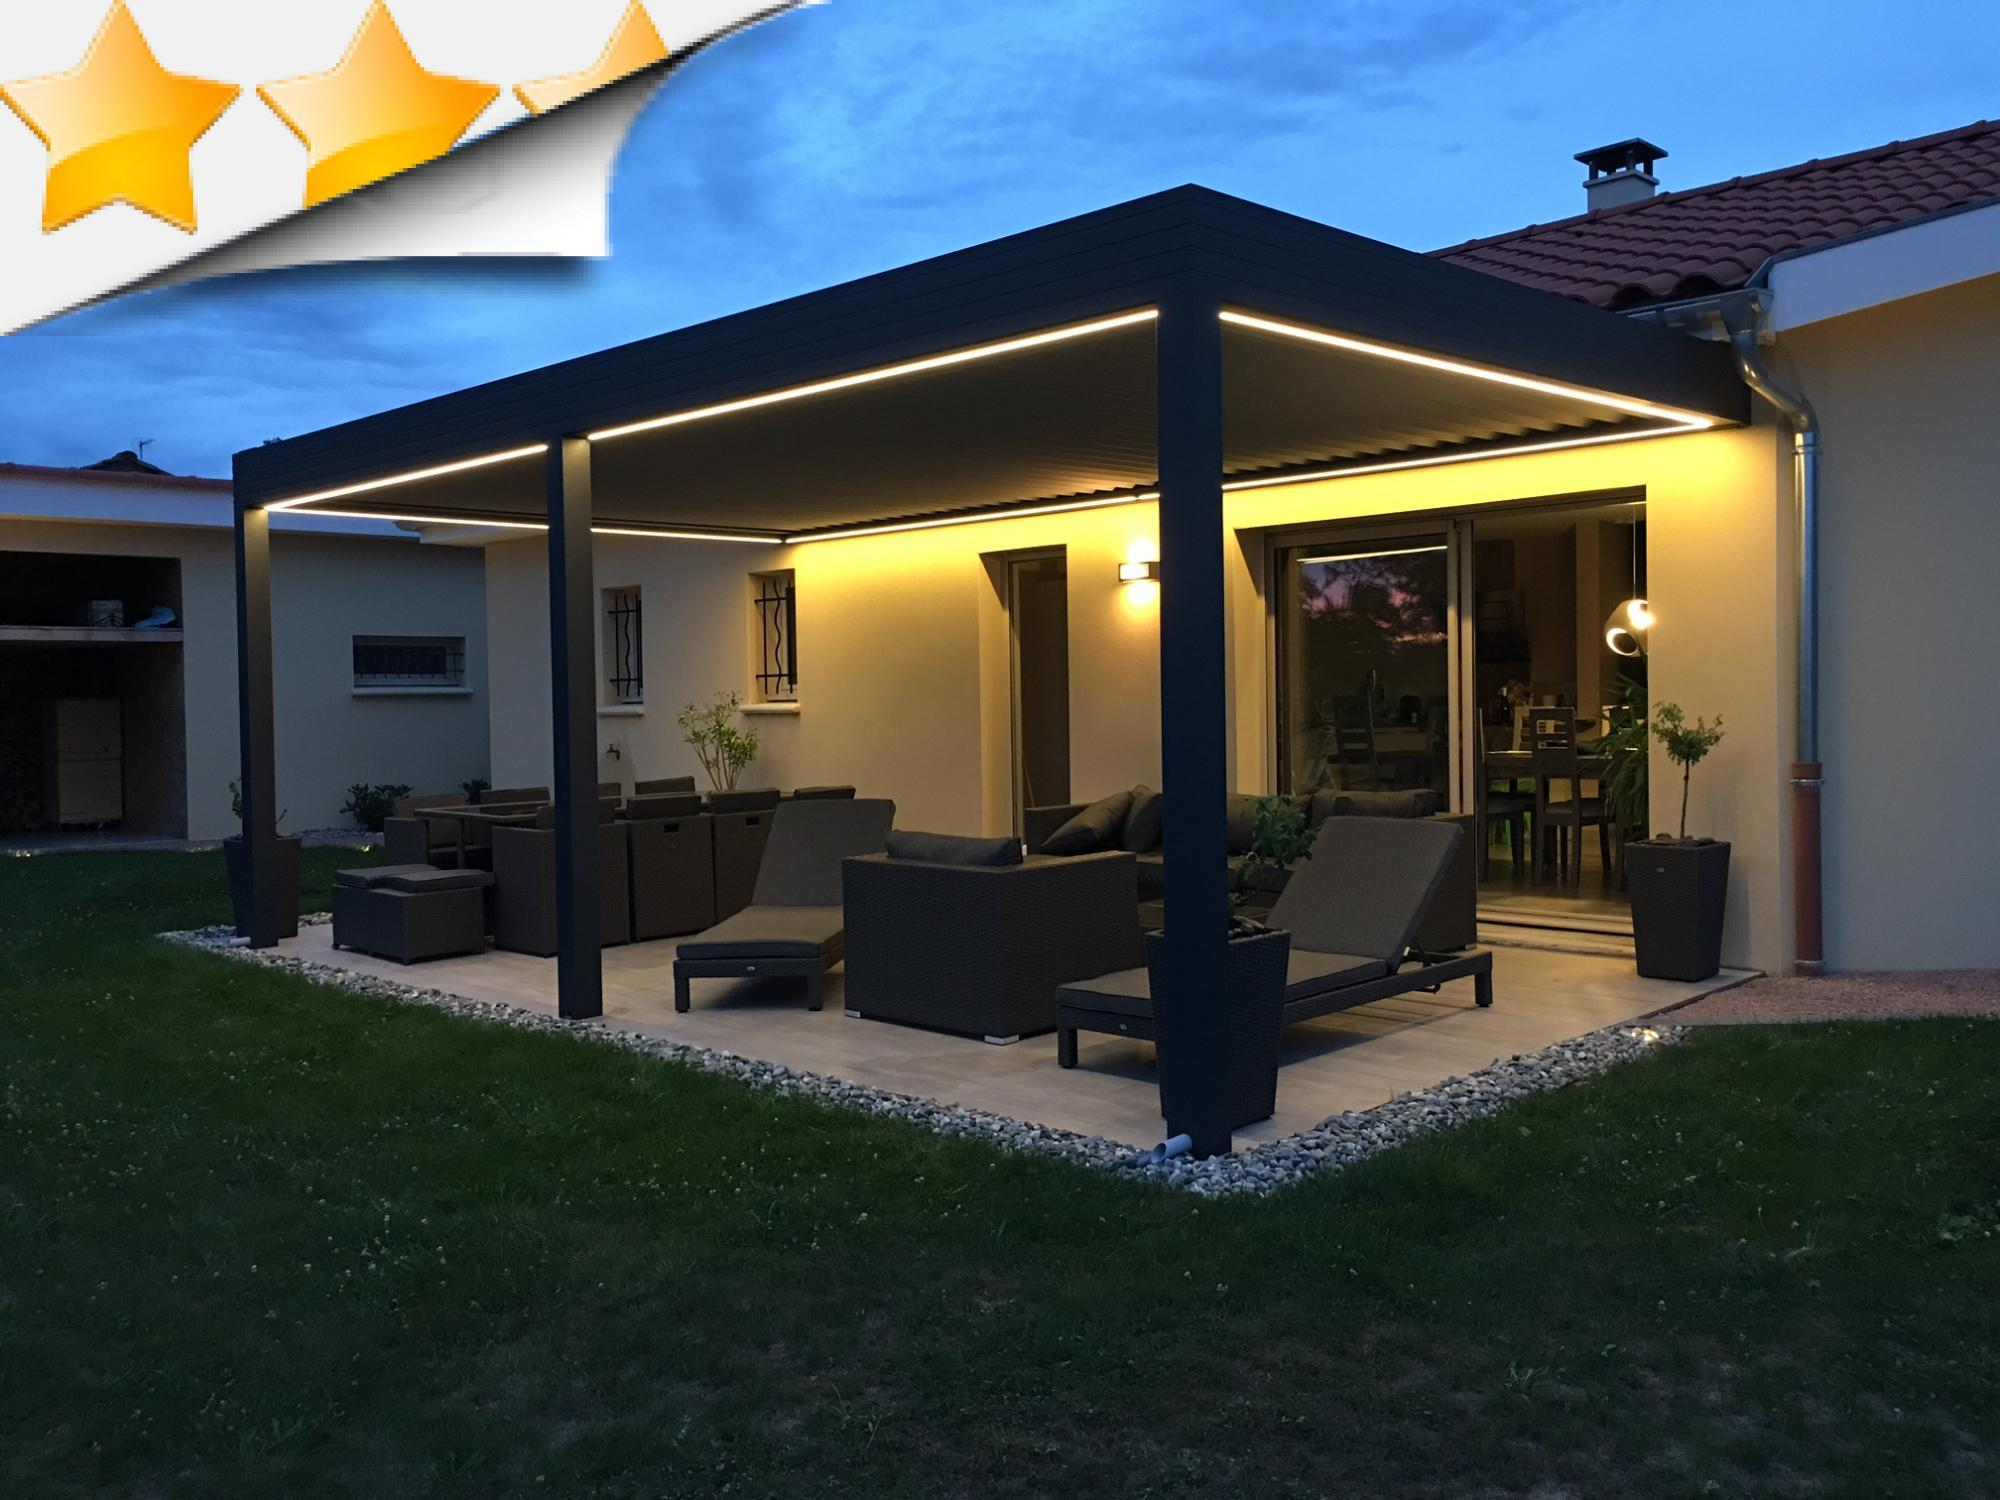 pergola avec clairage leds pergolas par apc. Black Bedroom Furniture Sets. Home Design Ideas